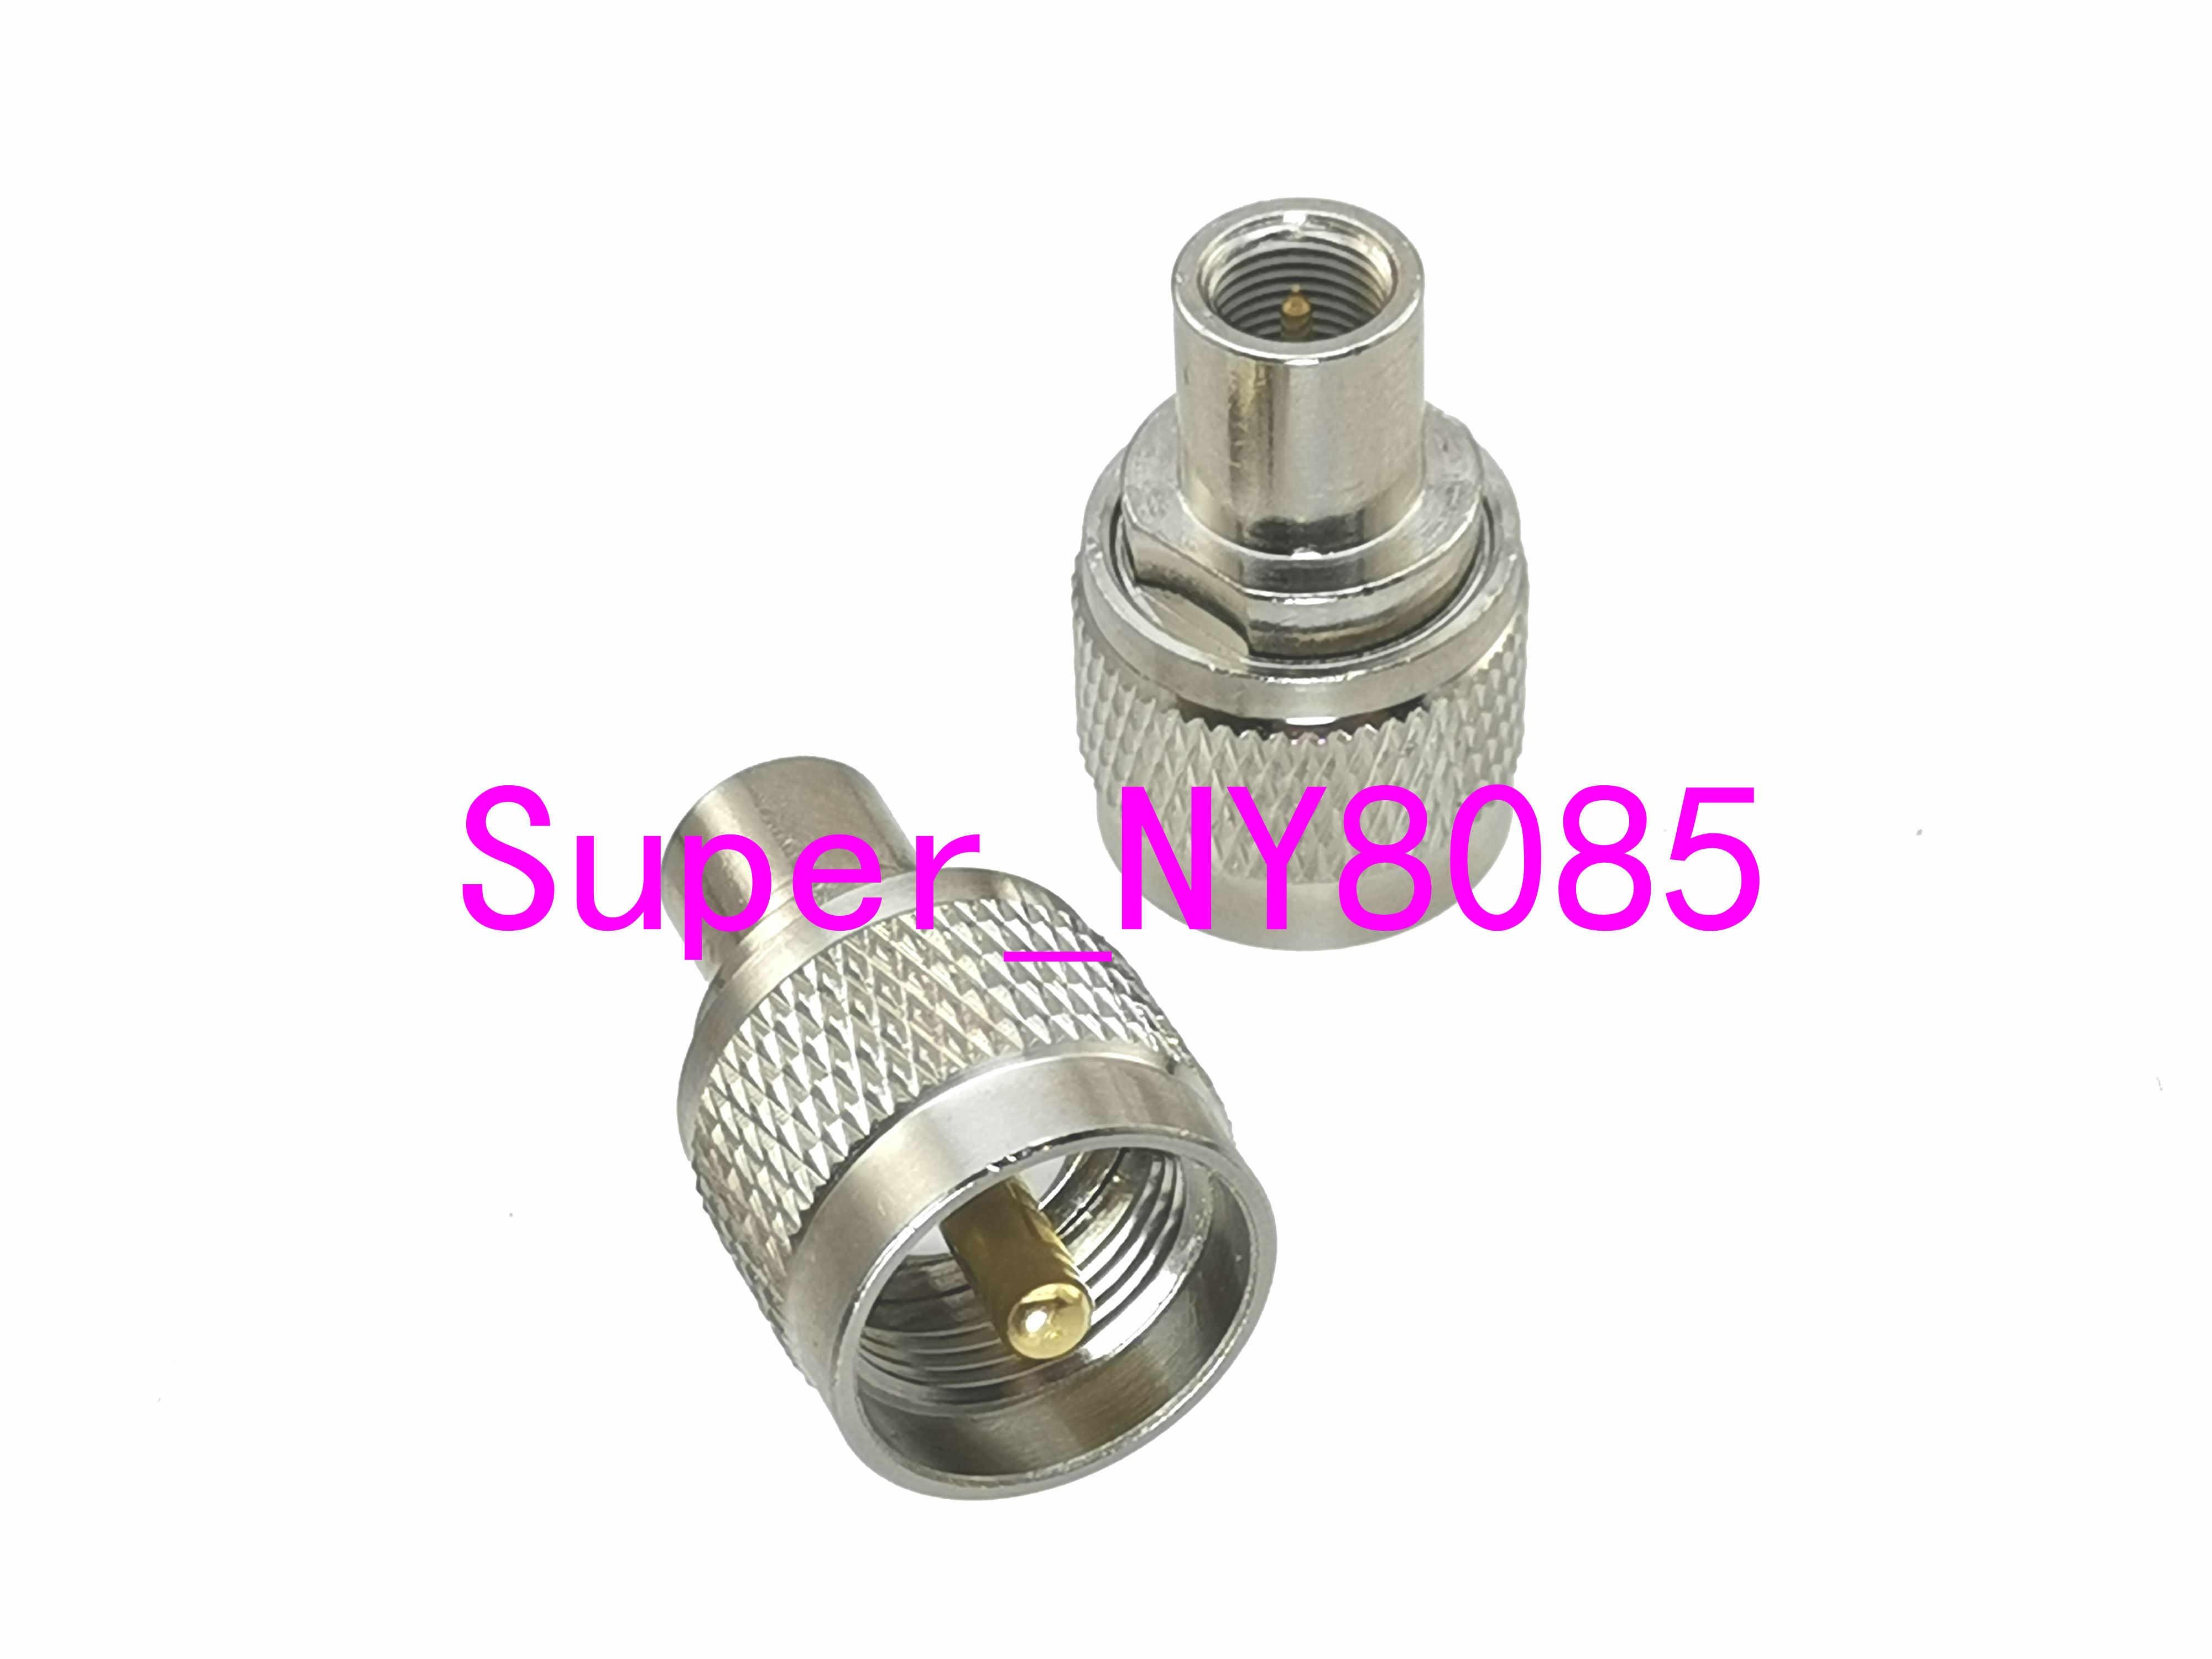 1pce FME Male Plug to miniUHF Female Jack RF Coax Adapter Connector Straight